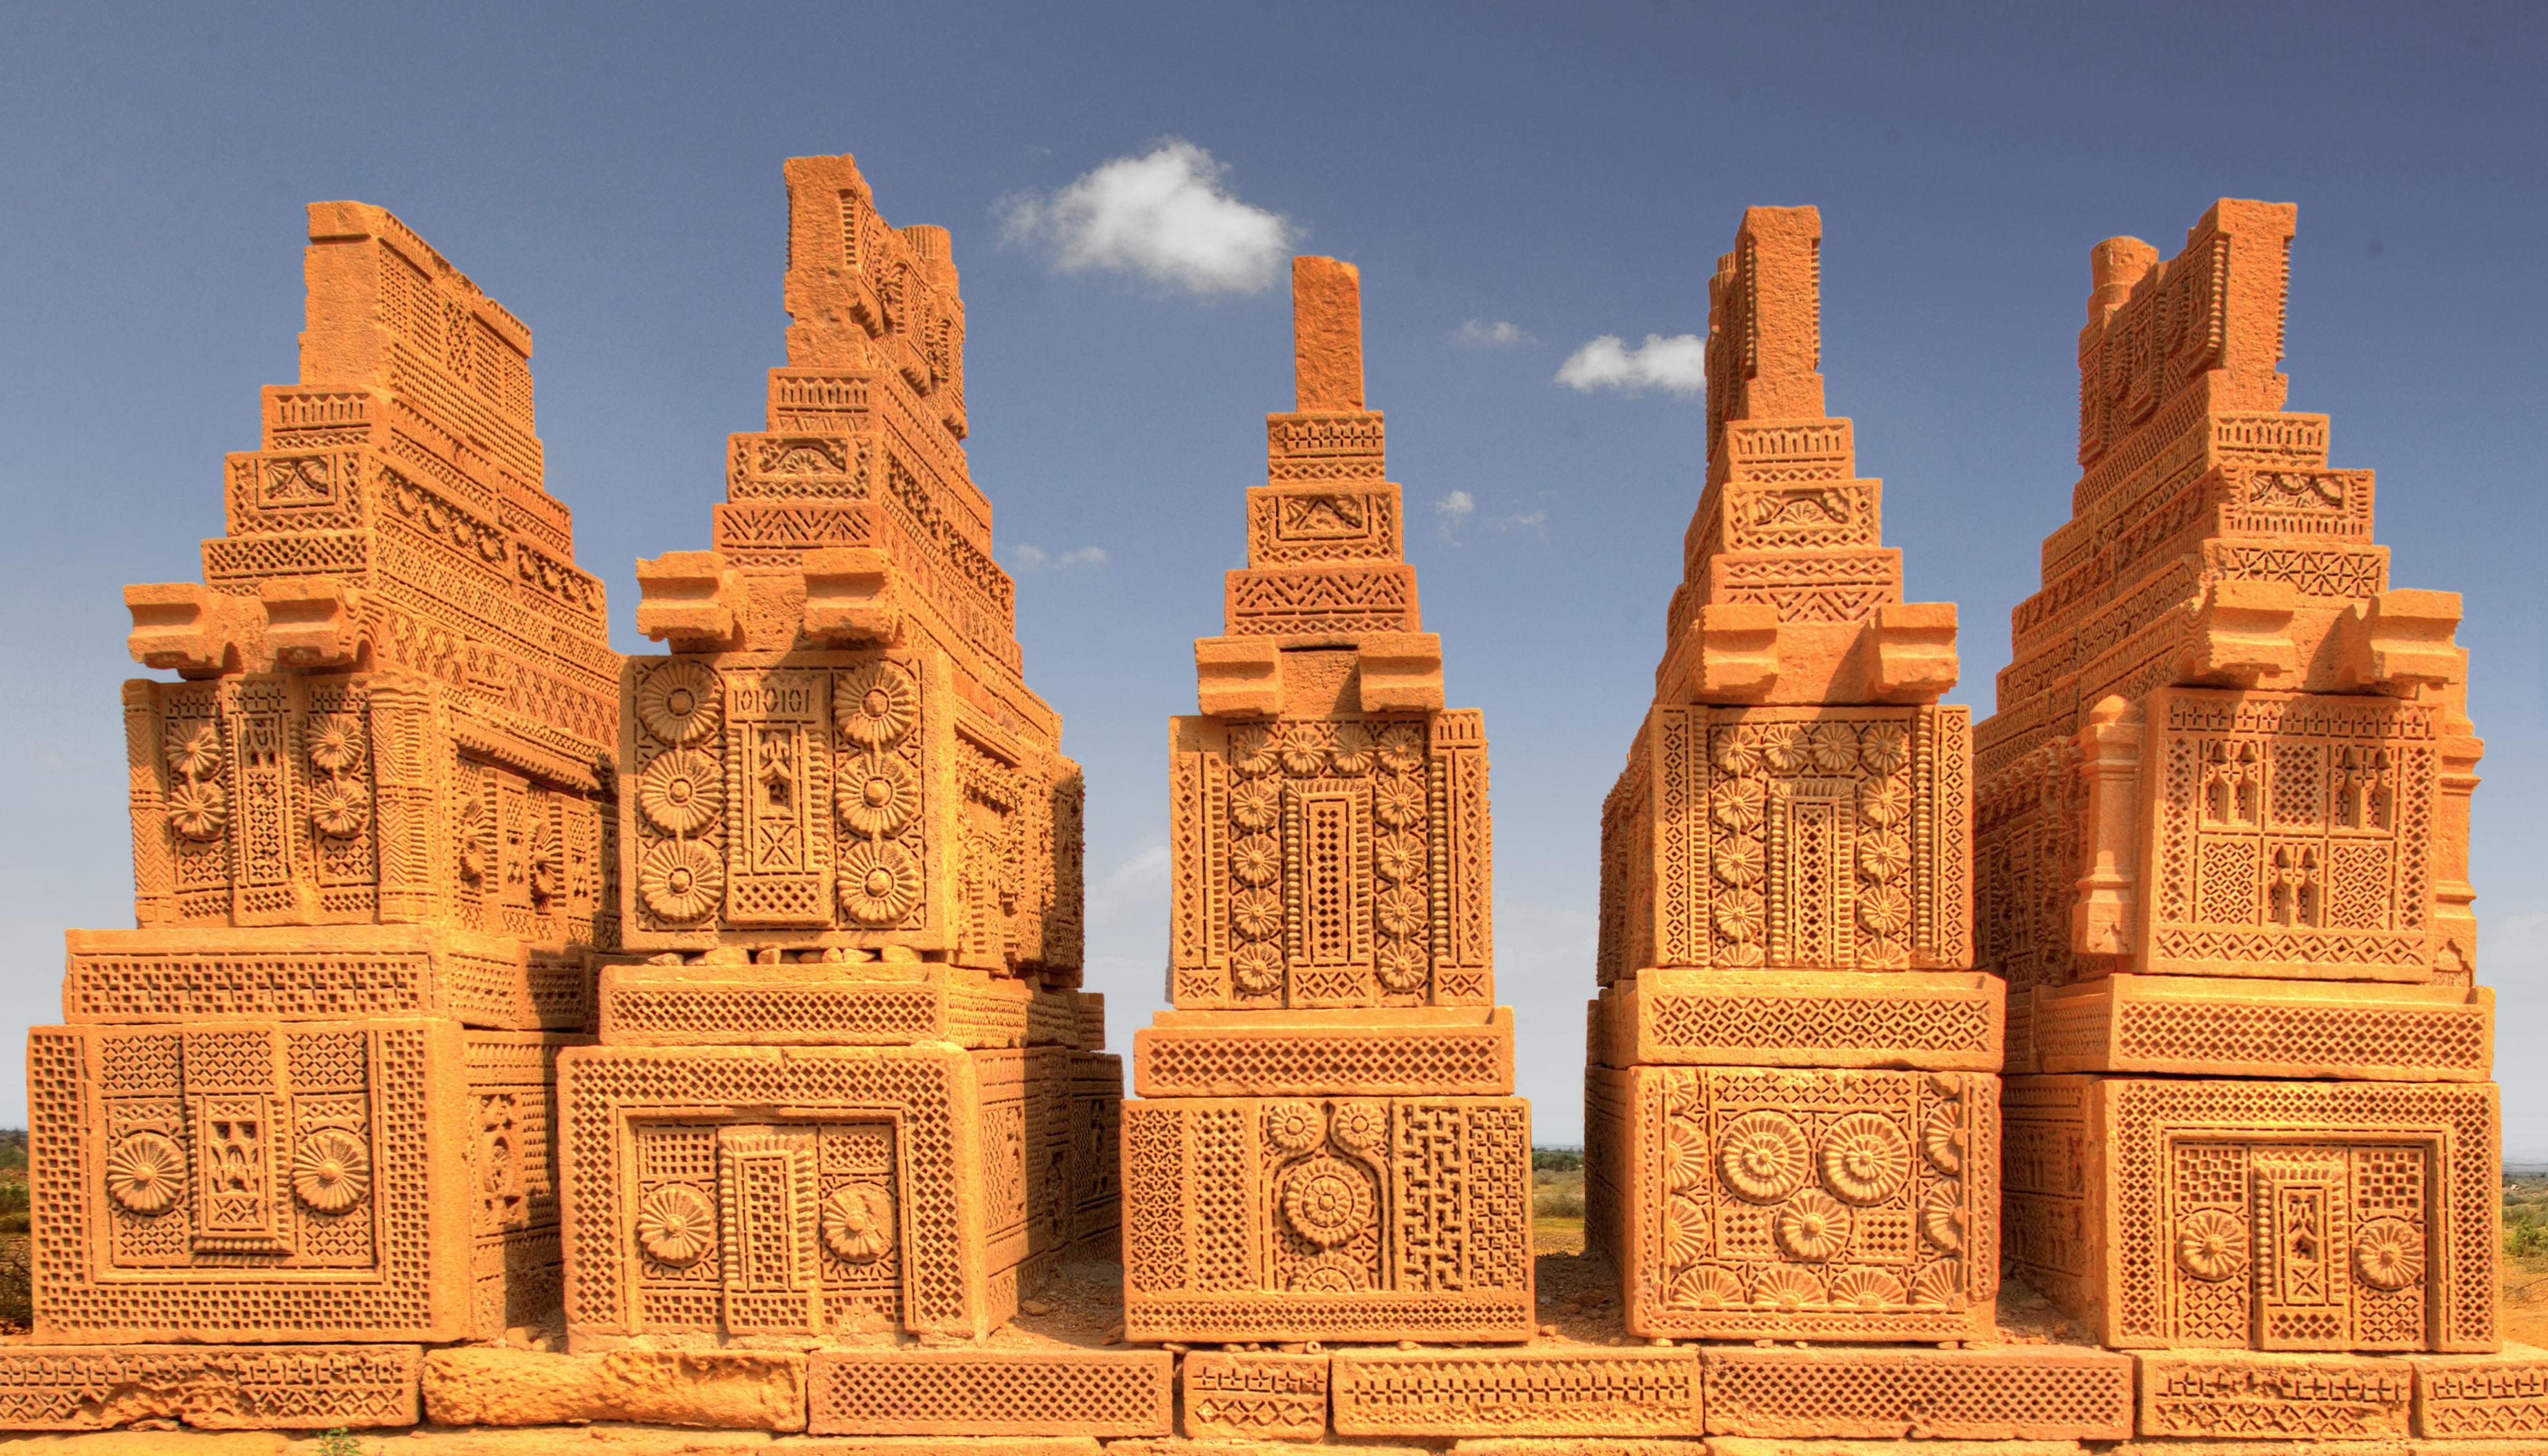 The Chaukhandi Tombs